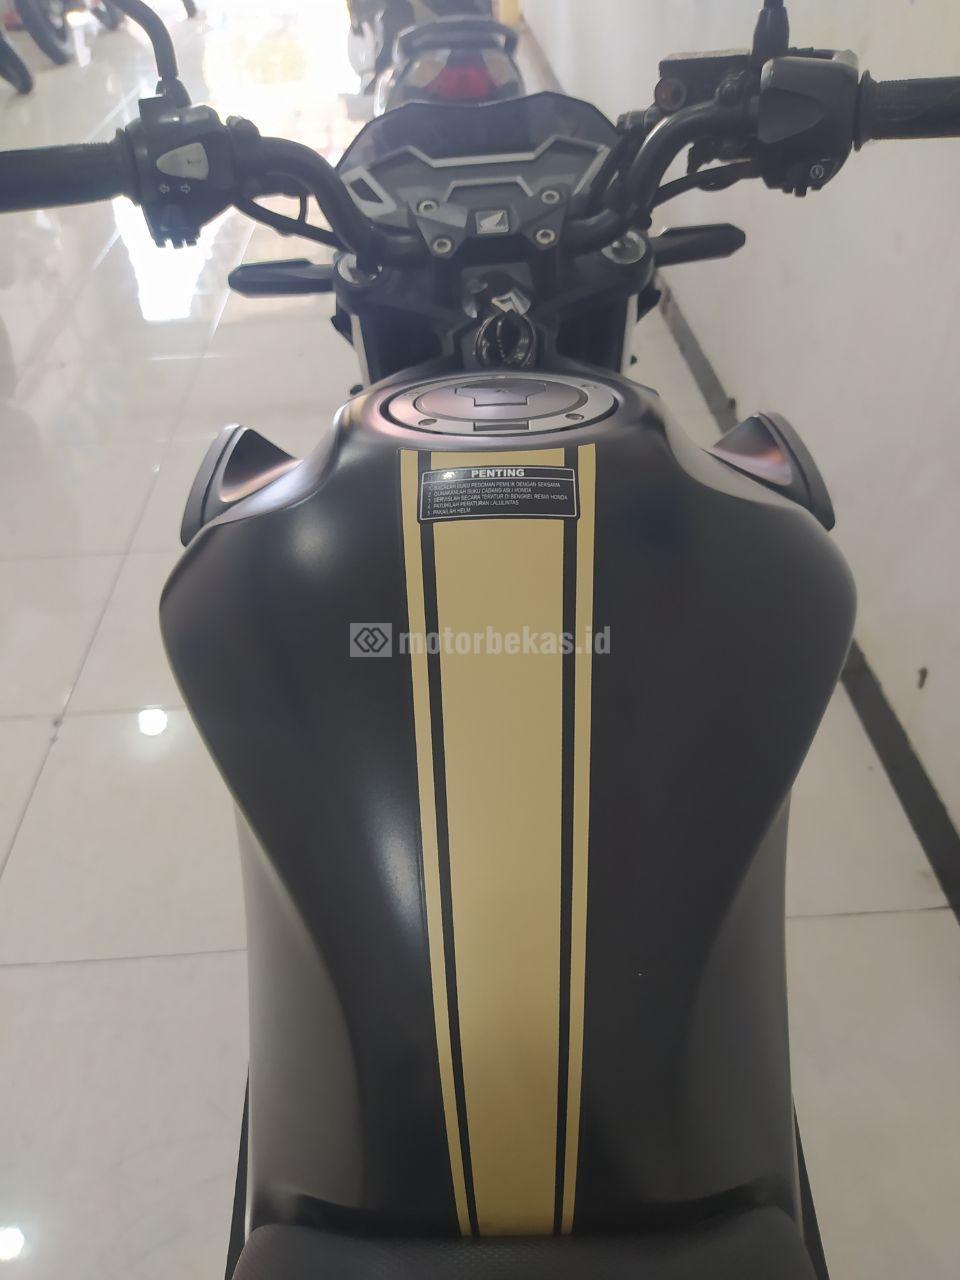 HONDA NEW CB150R SE  2117 motorbekas.id